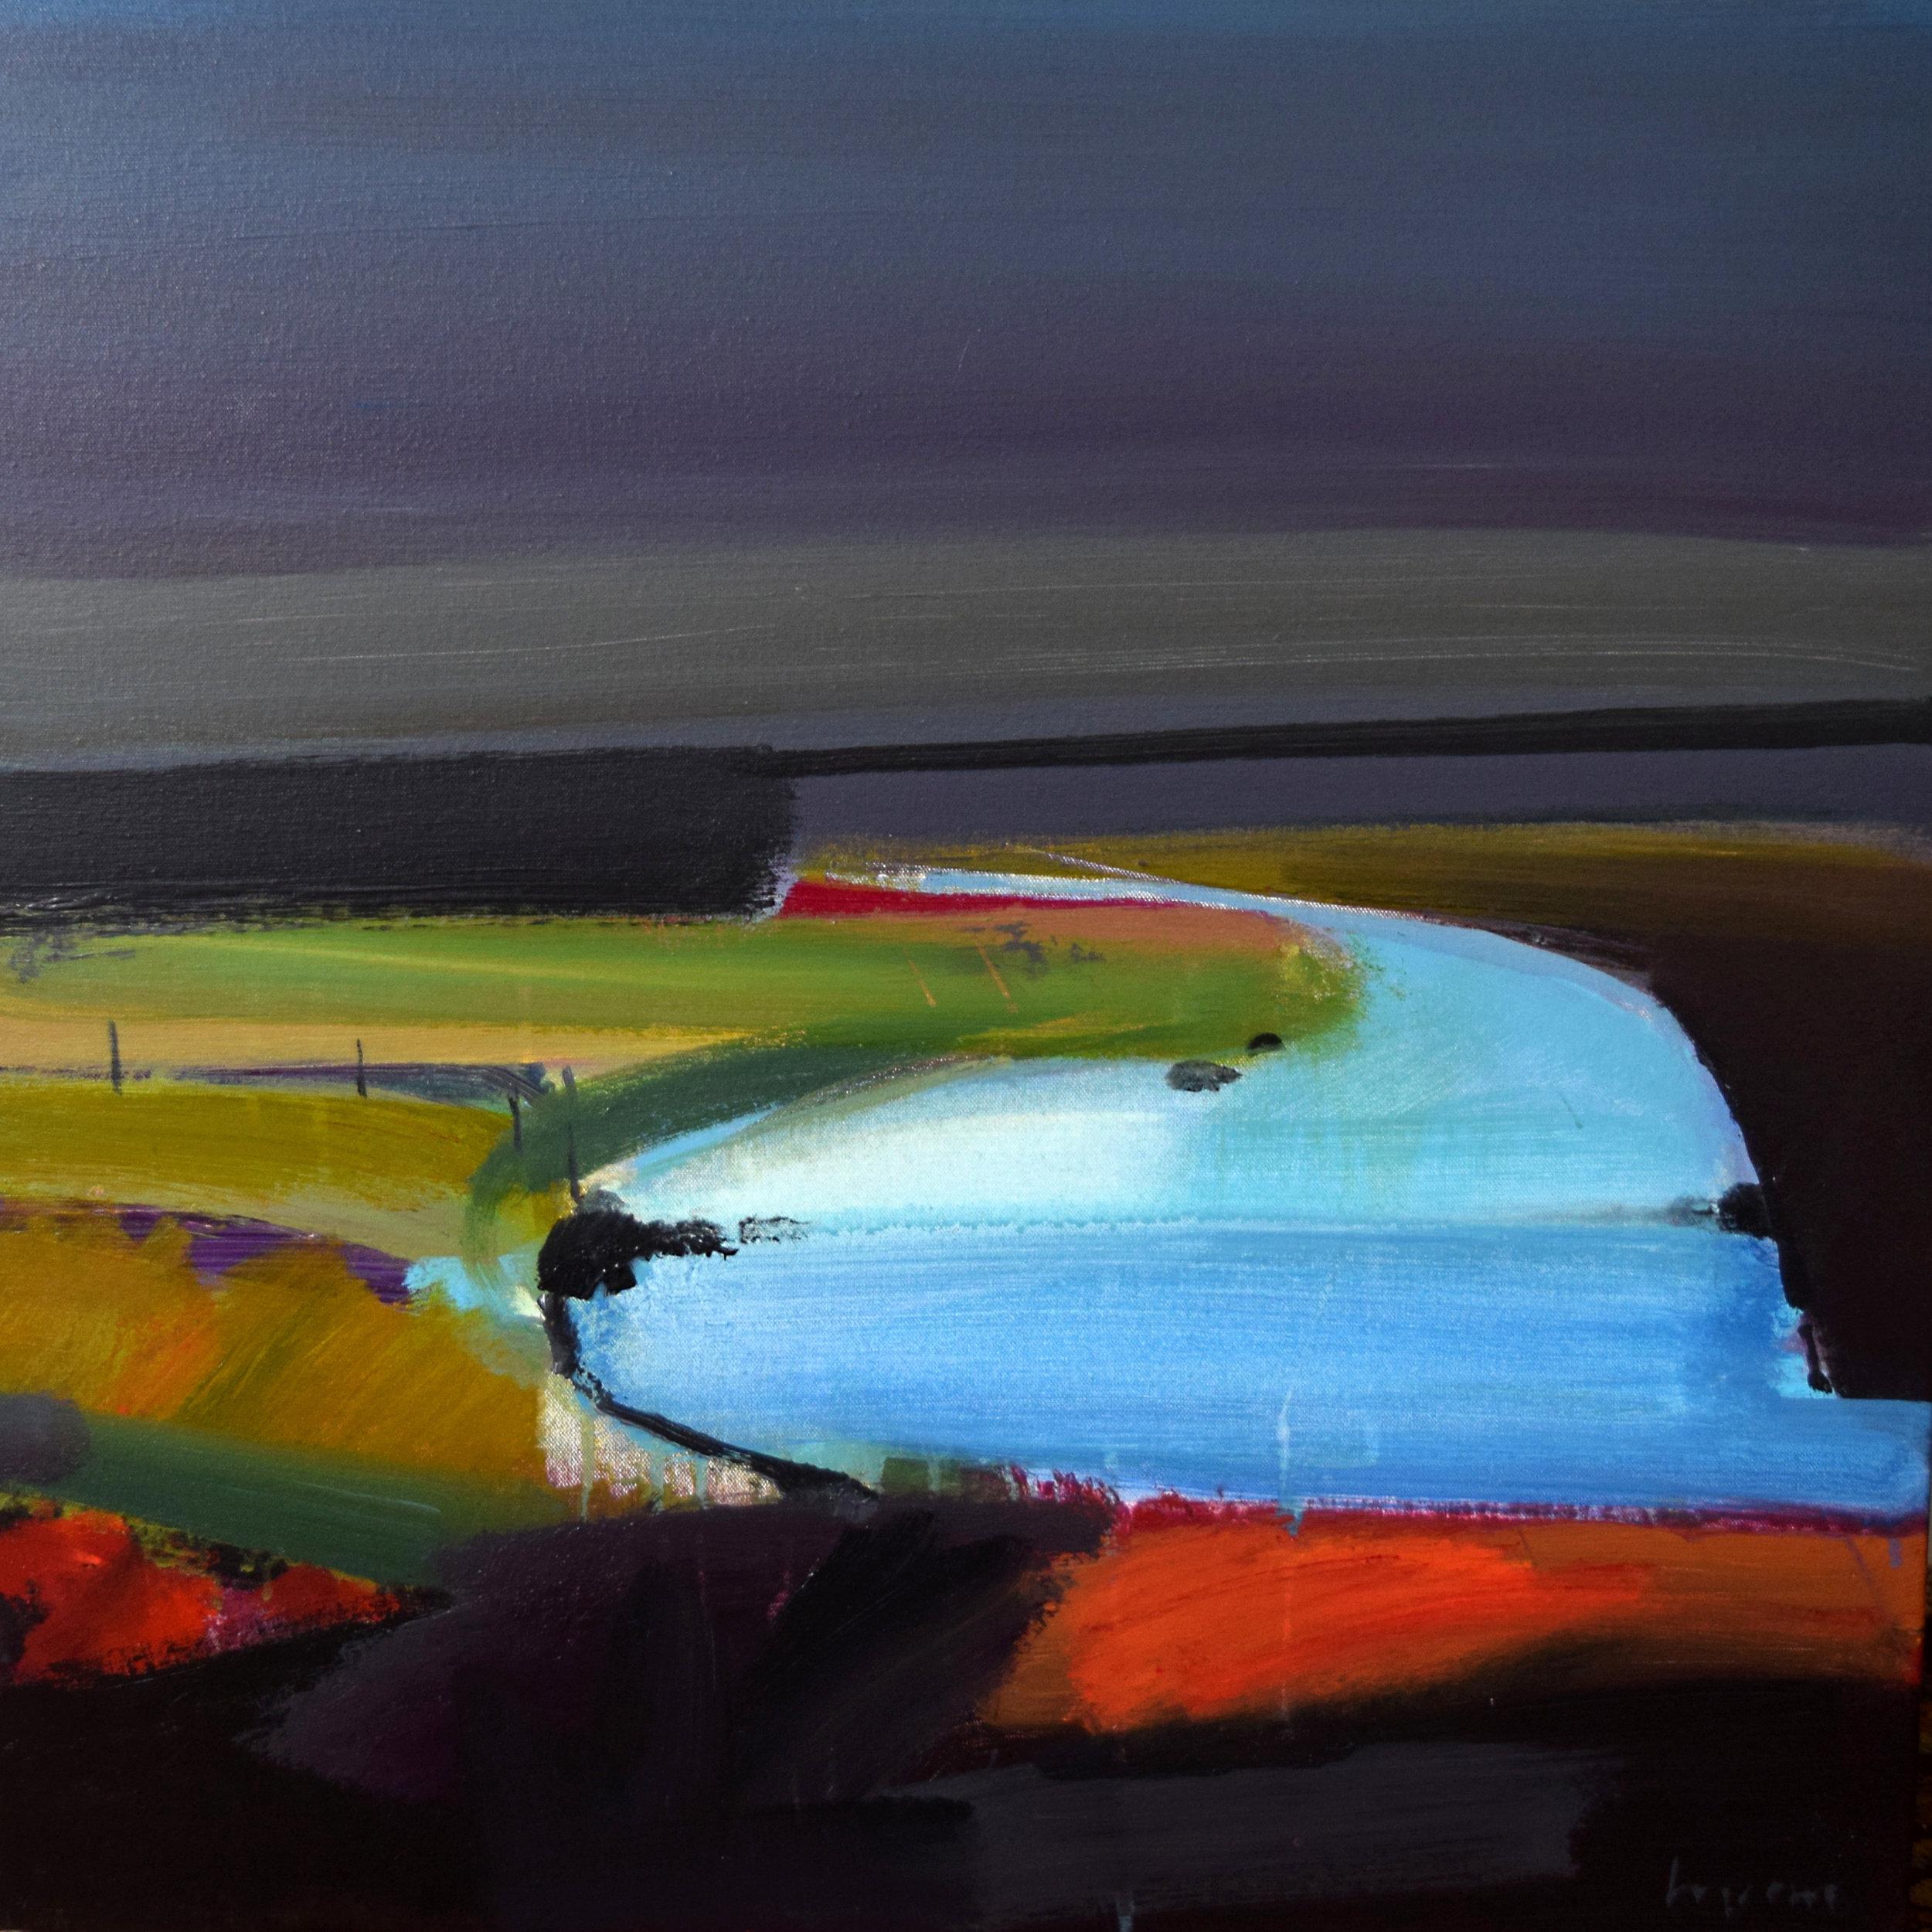 River Thurso, Westerdale, Caithness, Scotland